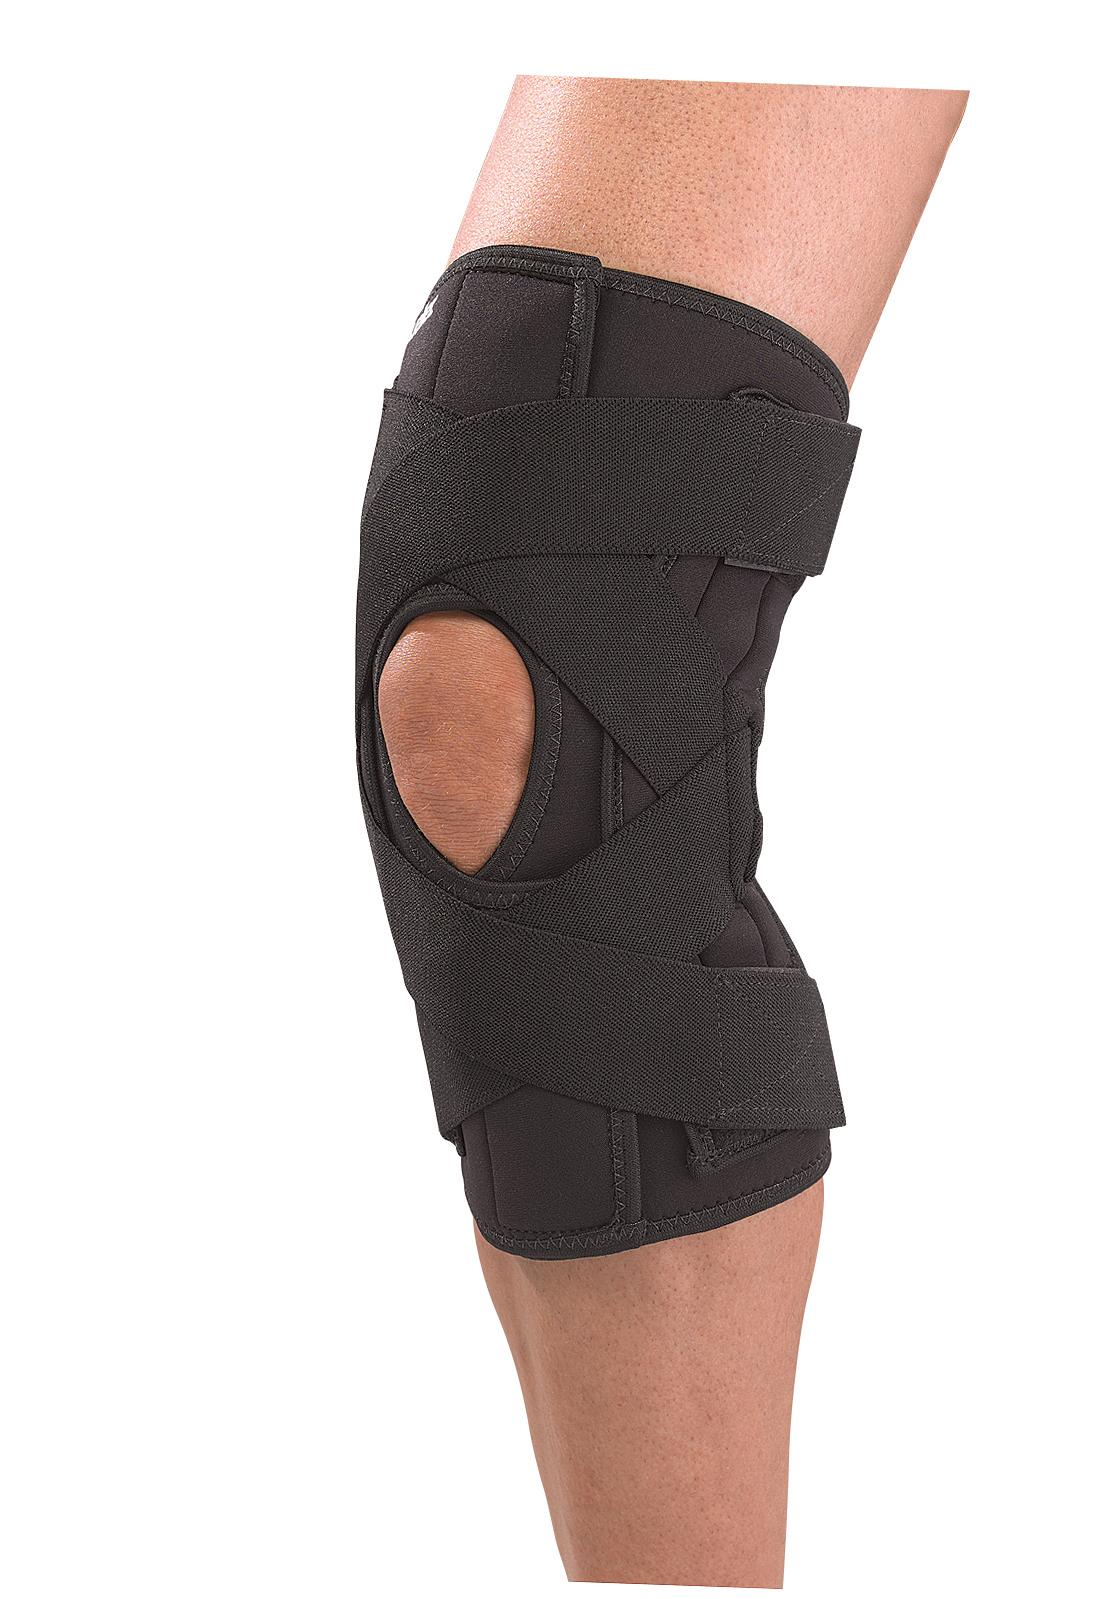 wraparound-knee-brace-deluxe-black-xl-230xl-74676637044-lr.jpg